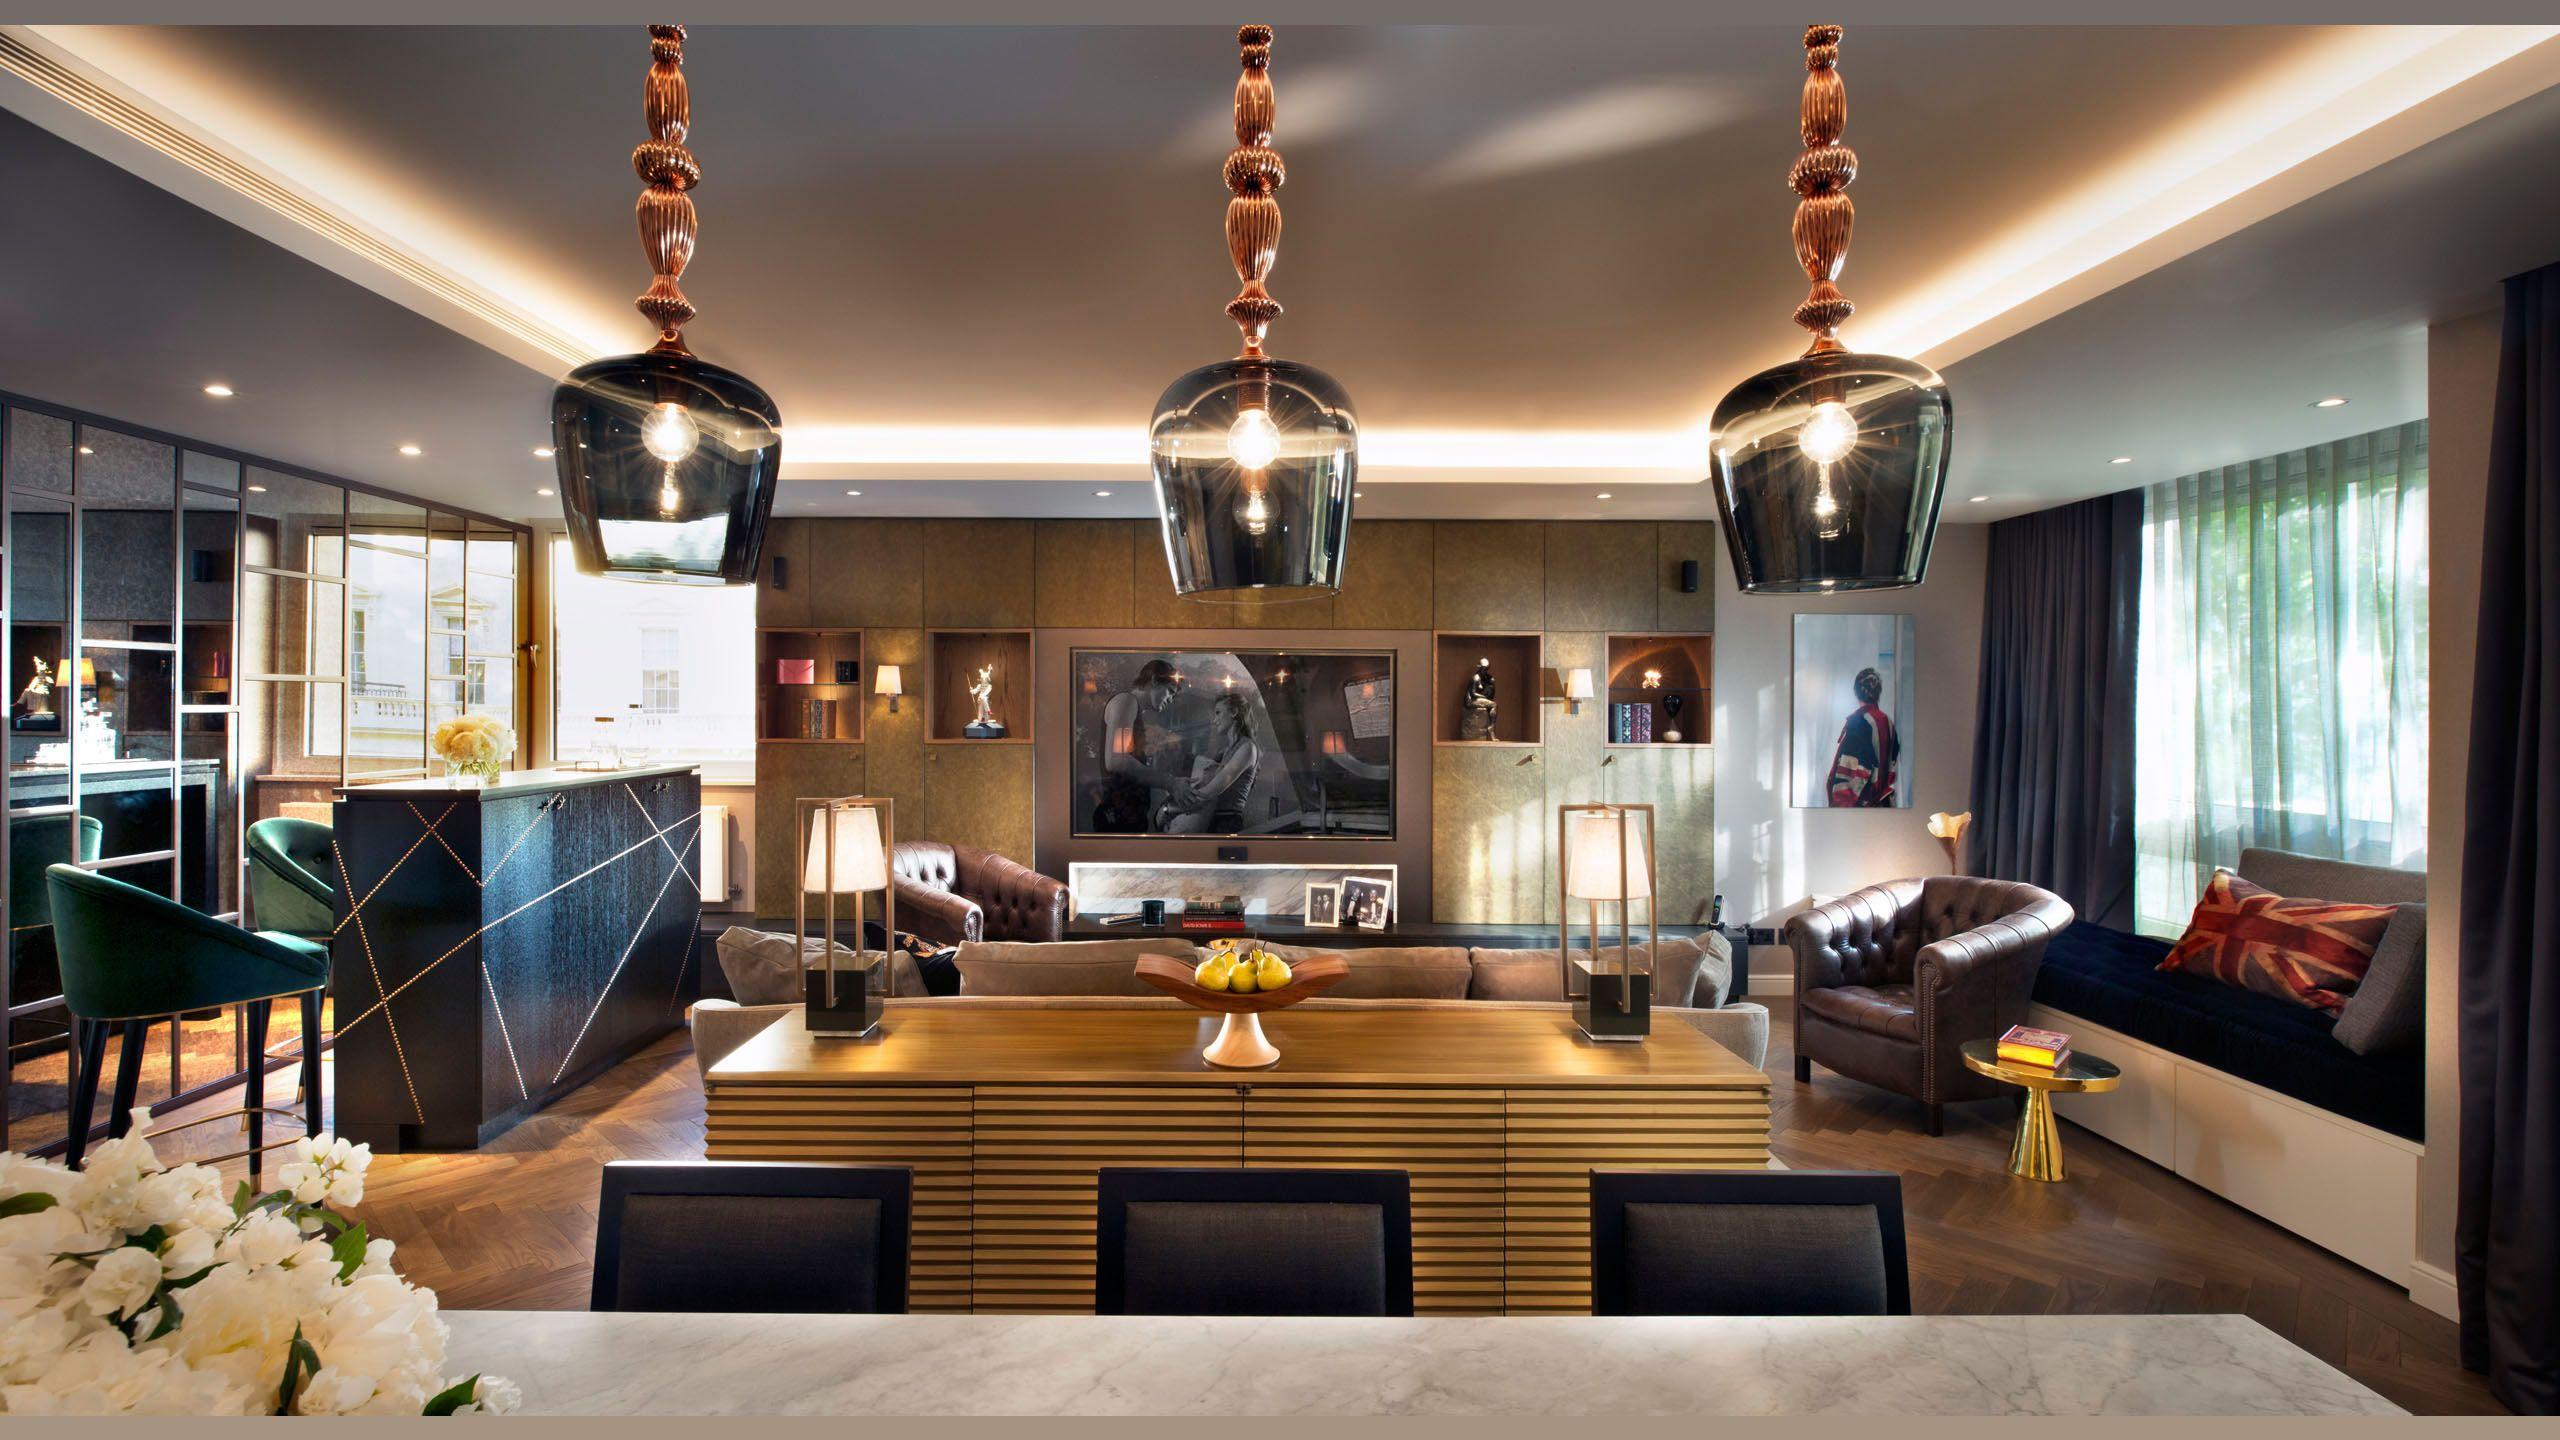 TG Studio Carlton House Terrace SW1Y House design